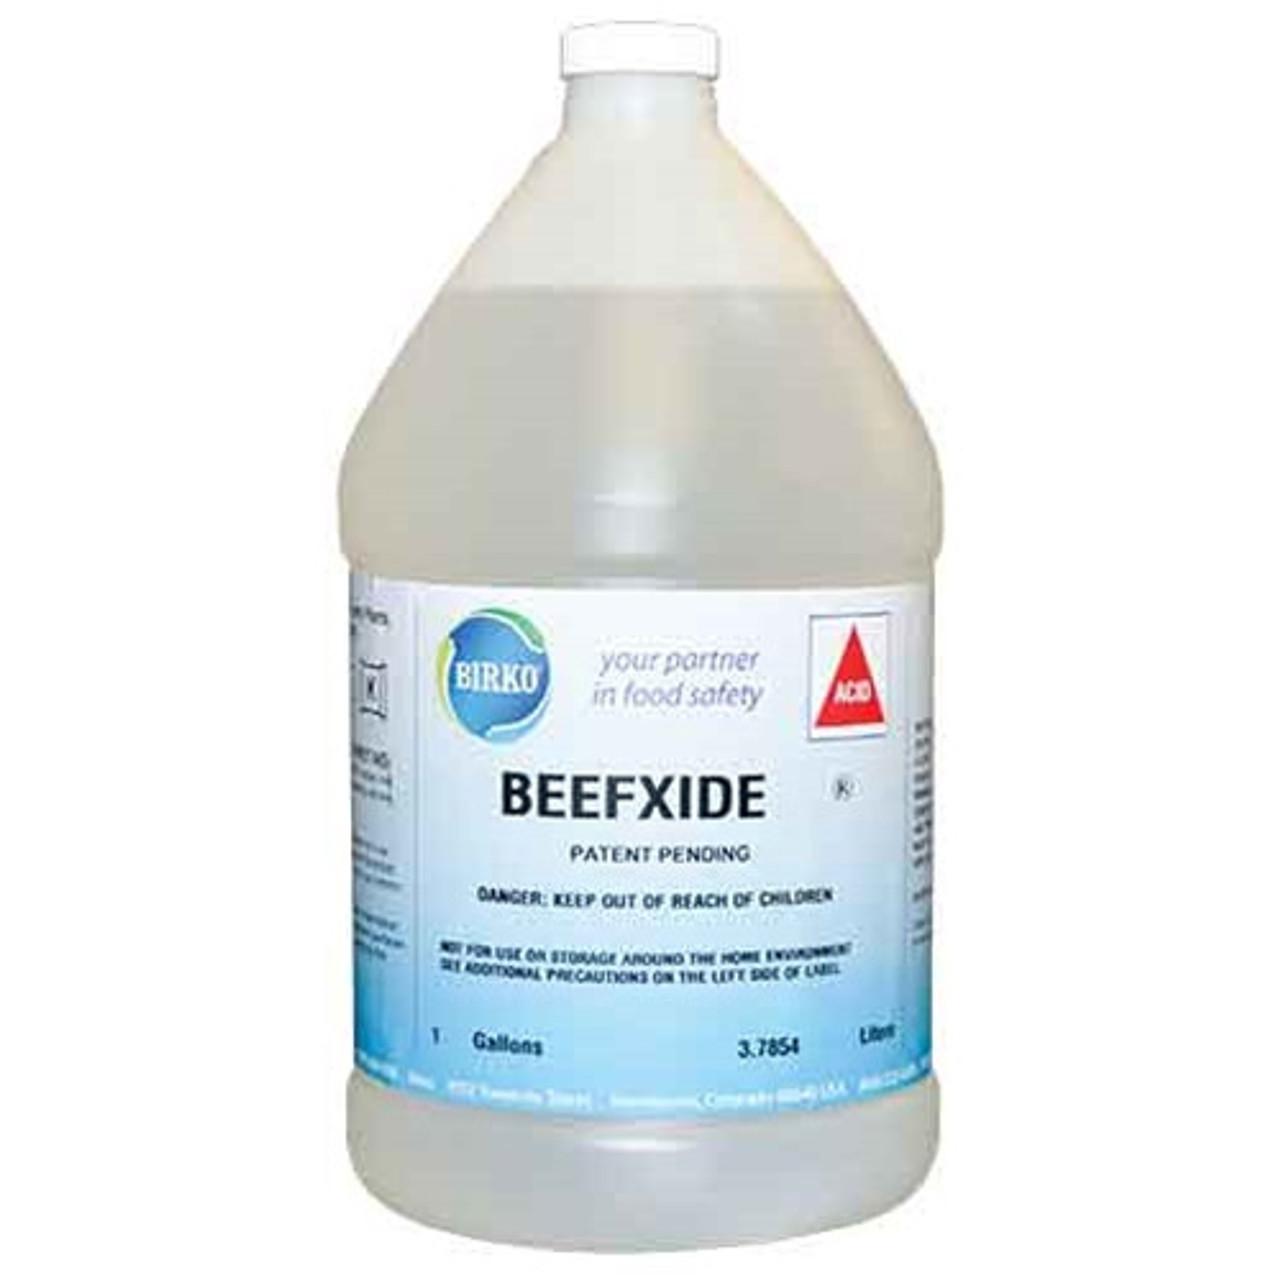 Birko Beefxide - 1 Case (4 Gallons) - I02659